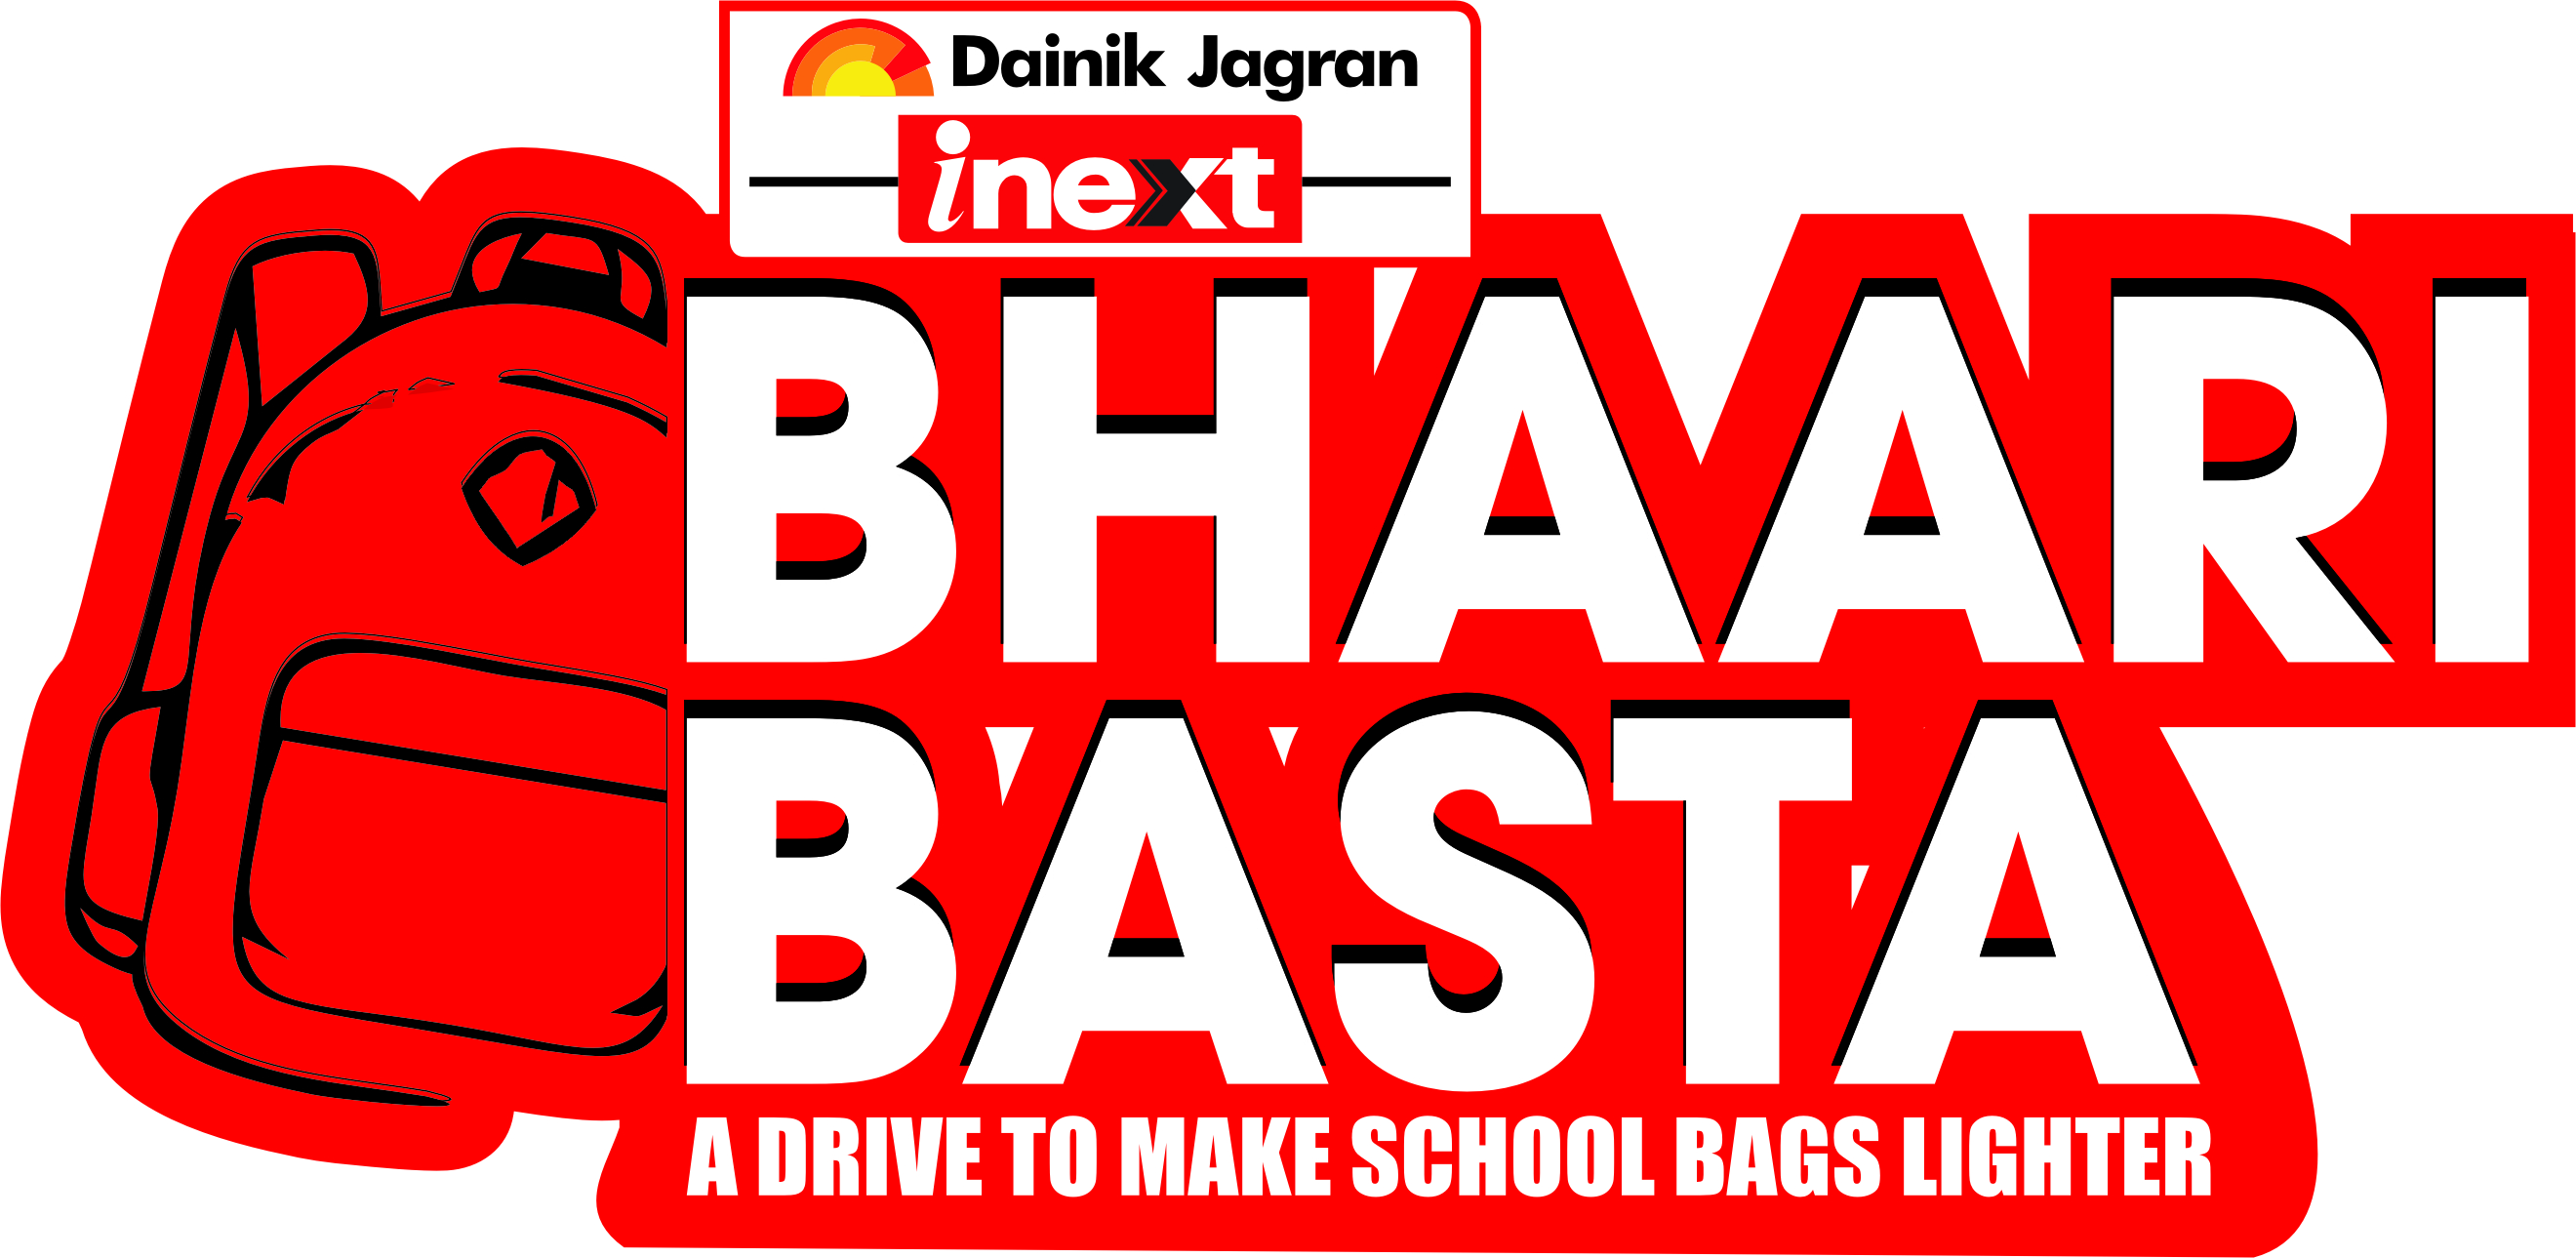 Bhari Basta - A Drive to Make School Bags Lighter